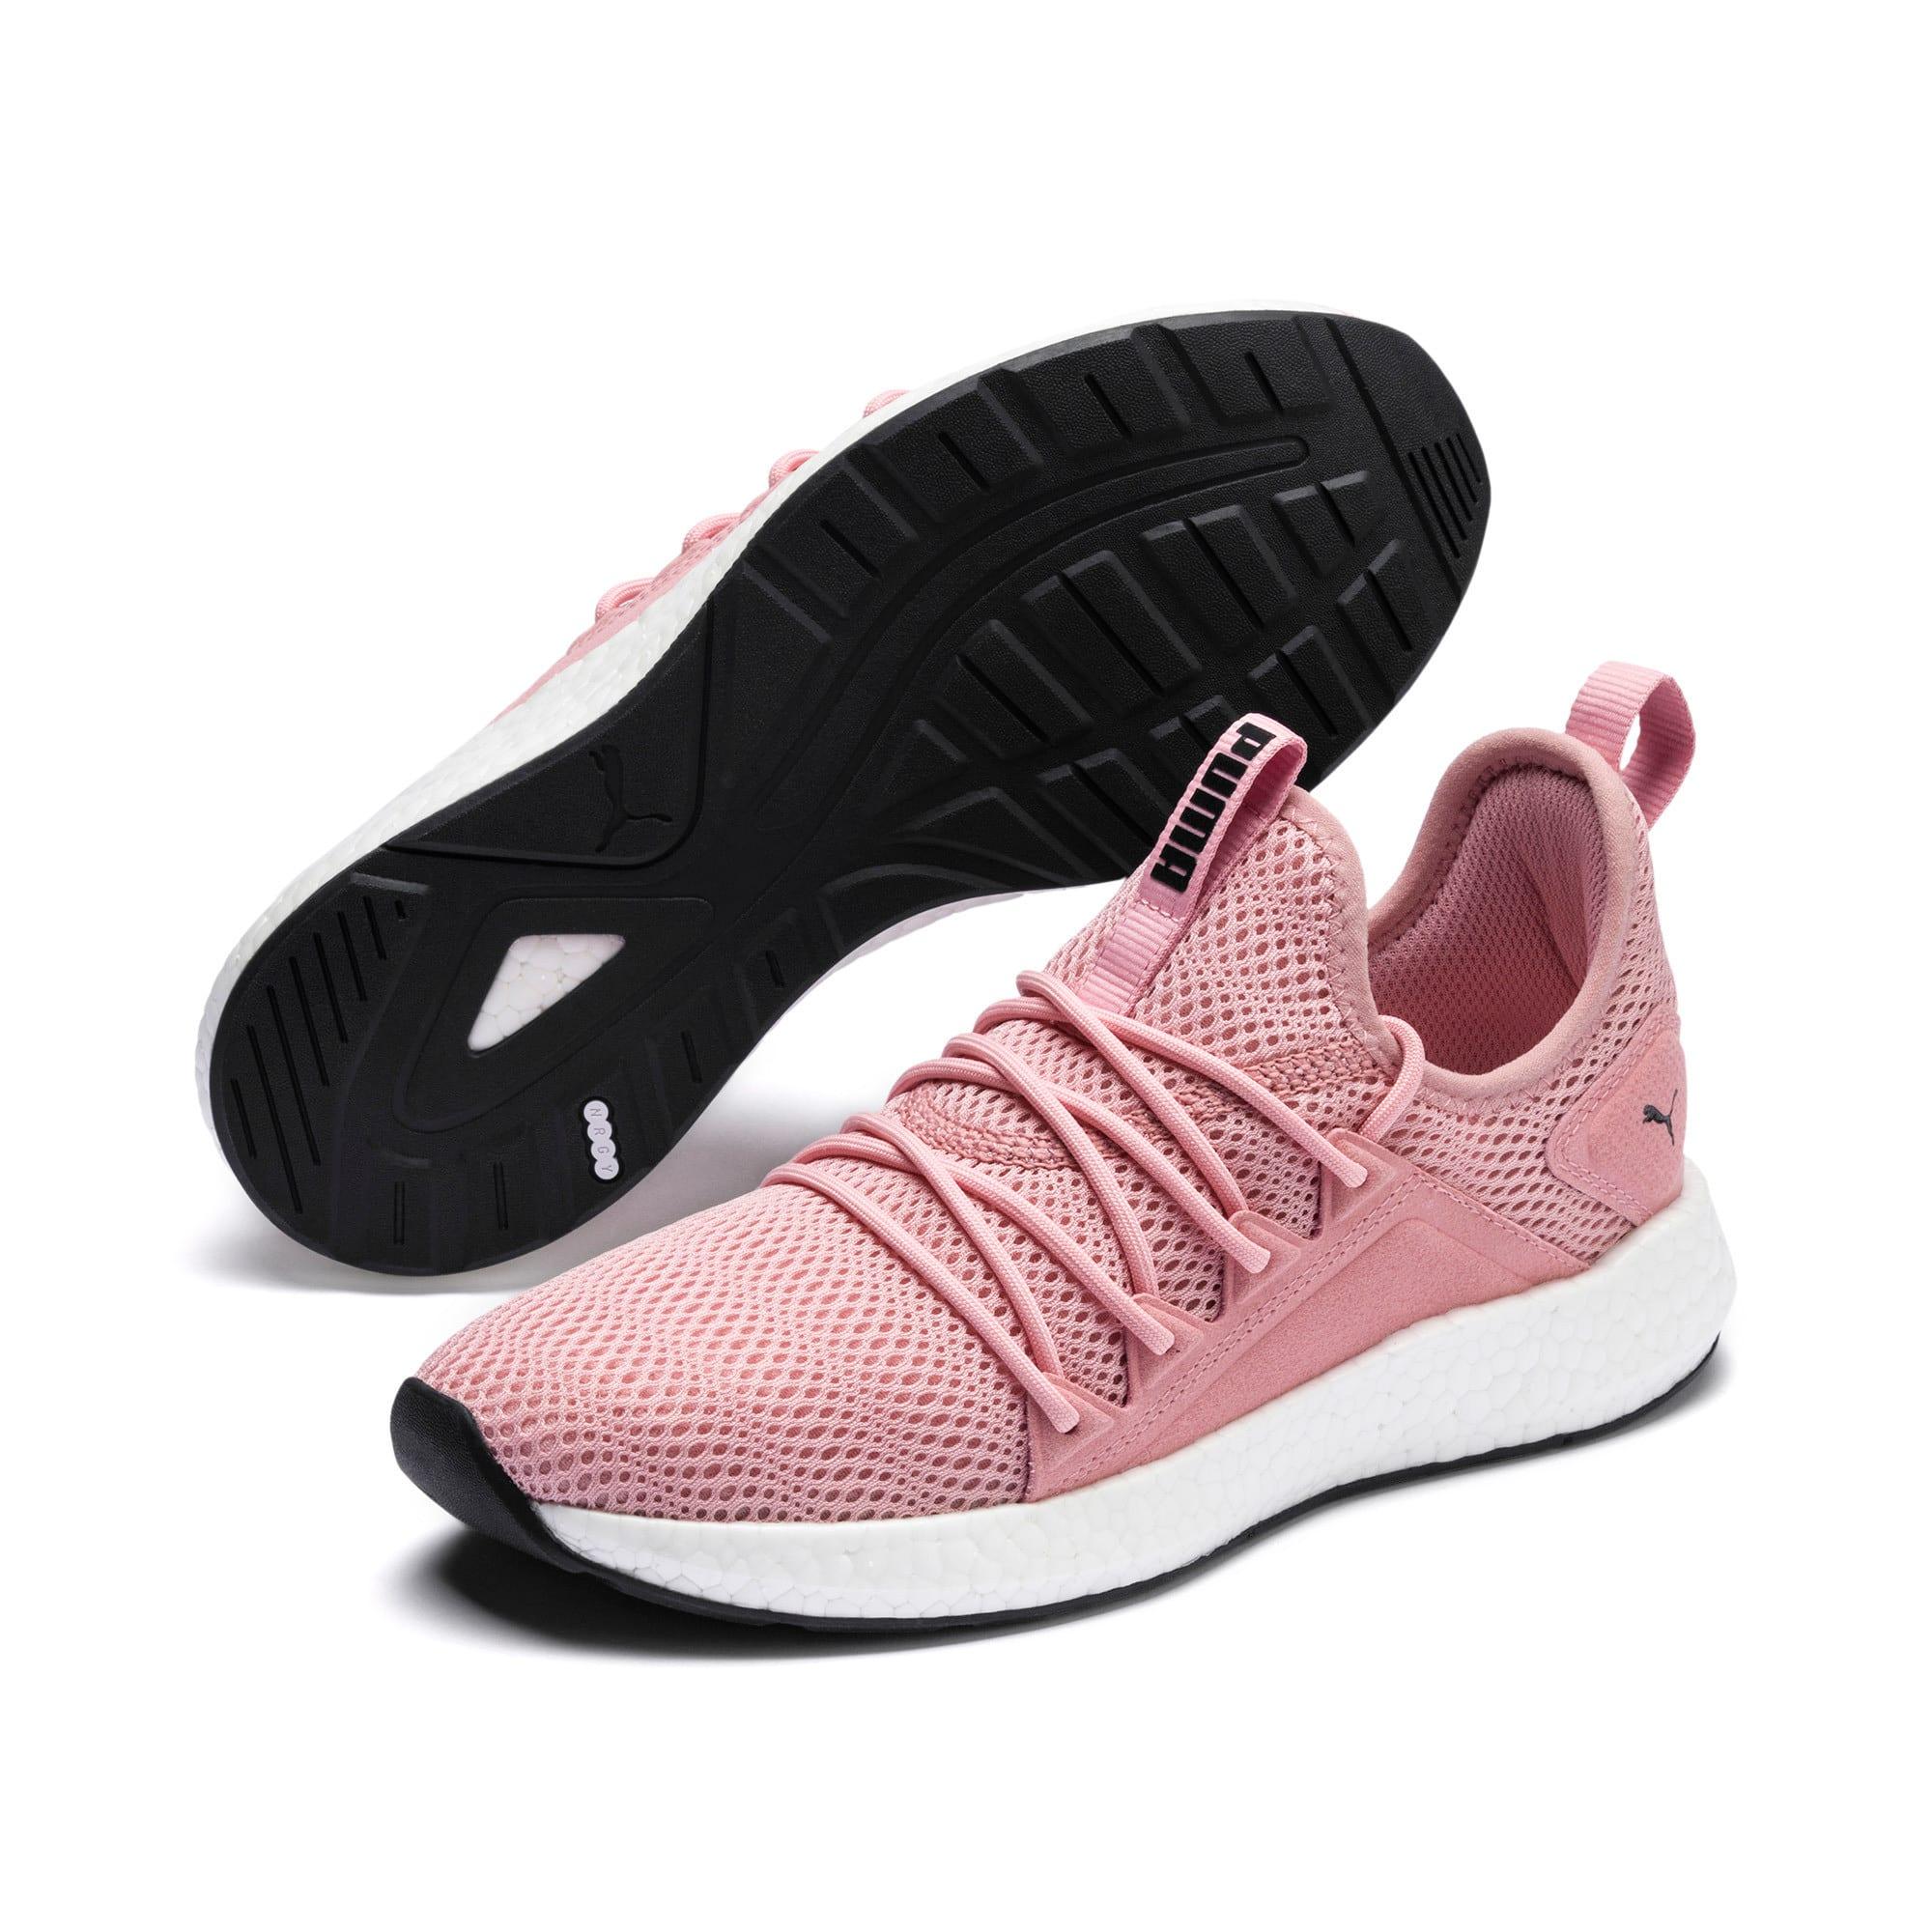 Thumbnail 3 of NRGY Neko Shift Women's Running Shoes, Bridal Rose-Puma White, medium